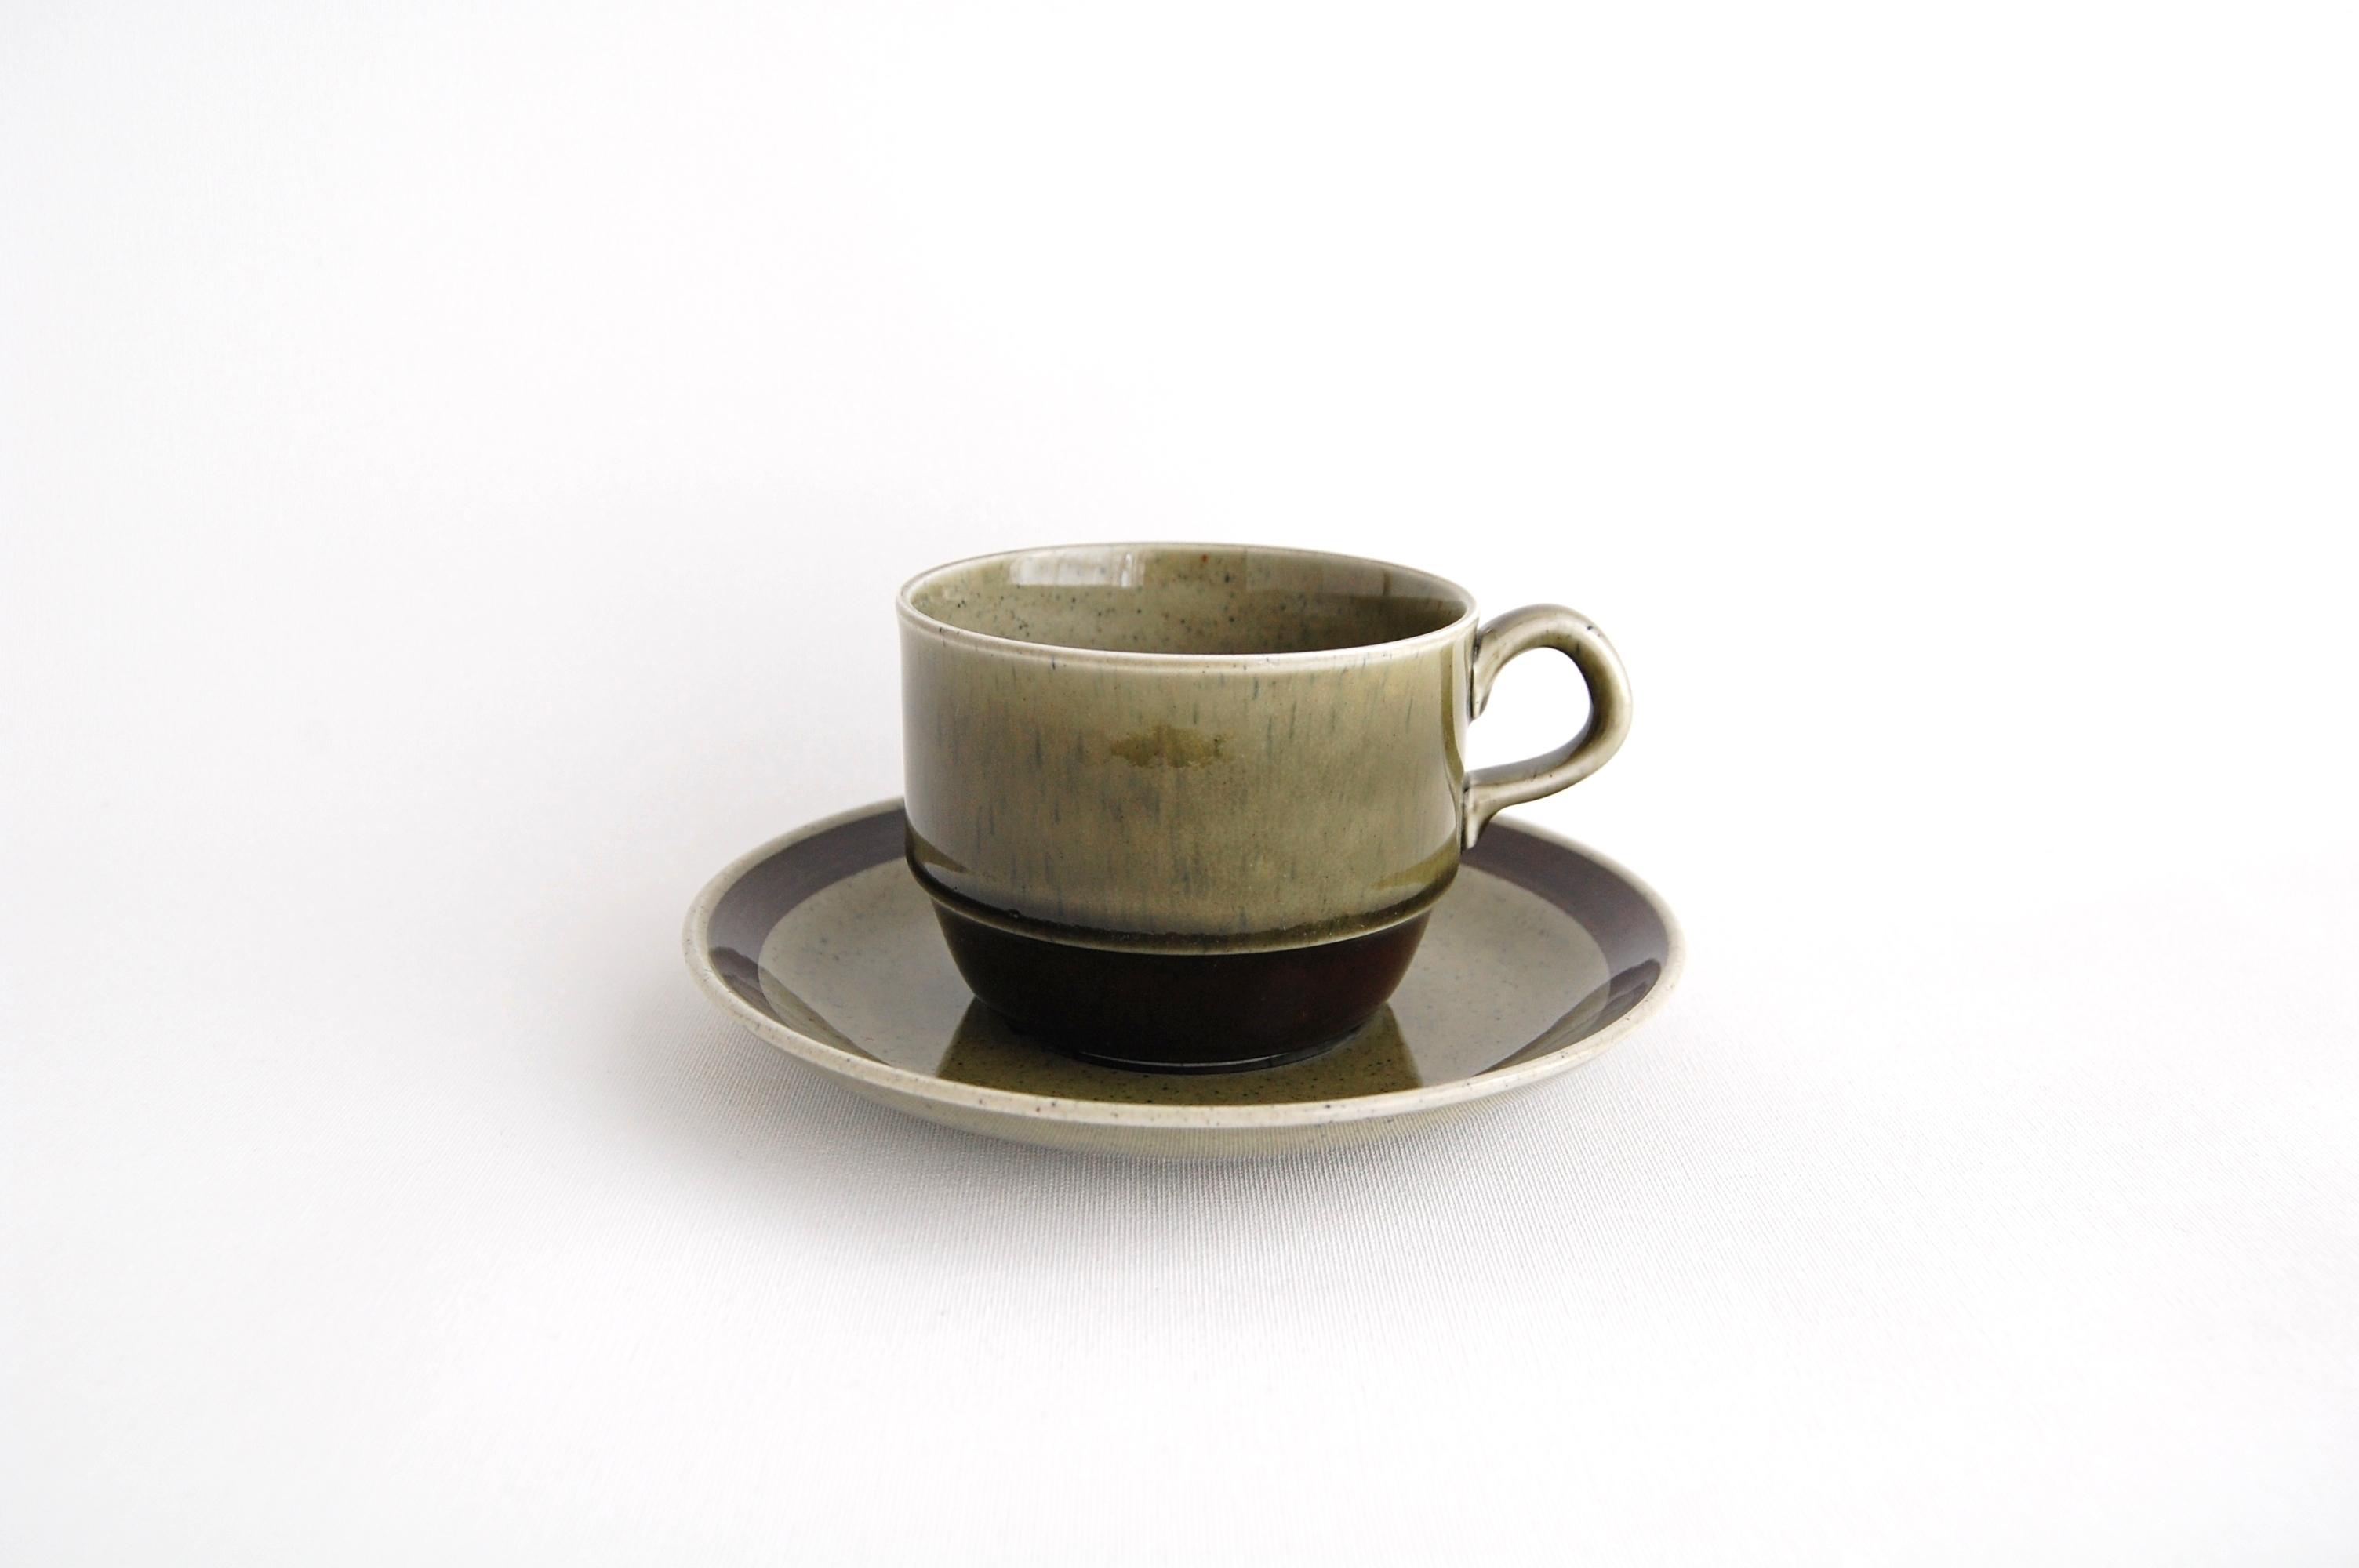 Rorstrand/ロールストランド Vieta/ヴィータ コーヒーカップ&ソーサー 002